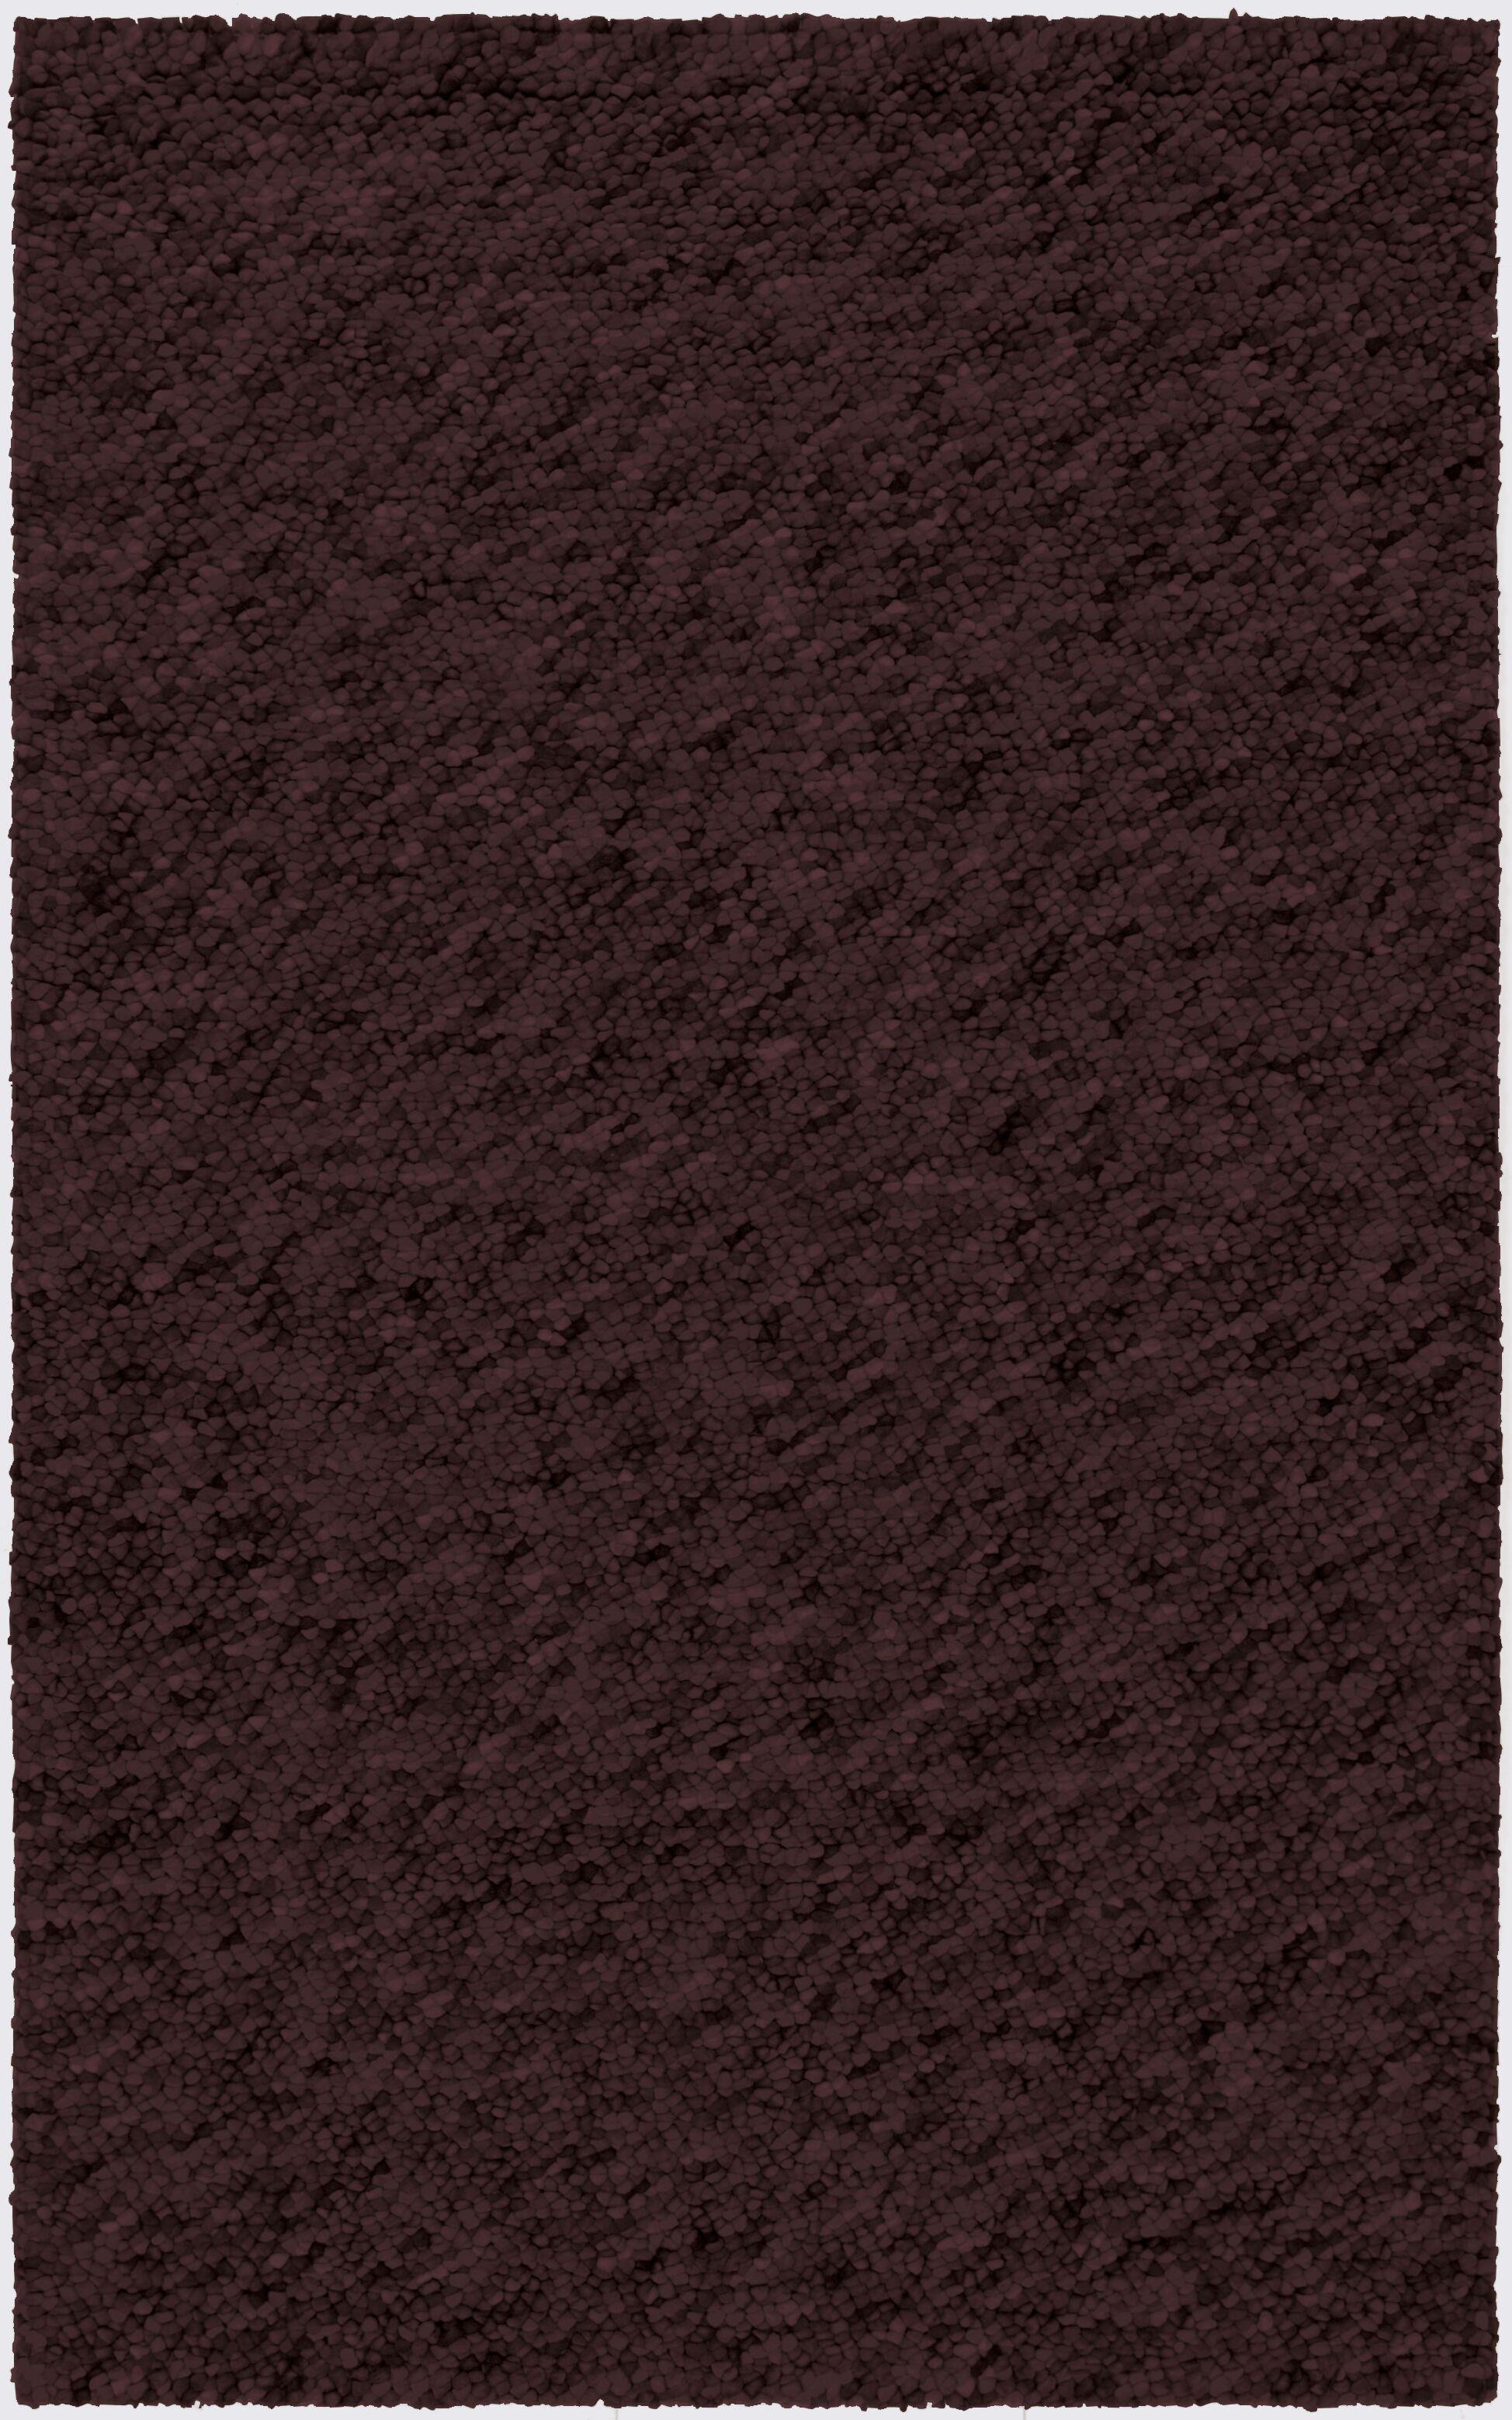 Pablo Burgundy Rug Rug Size: Rectangle 8' x 10'